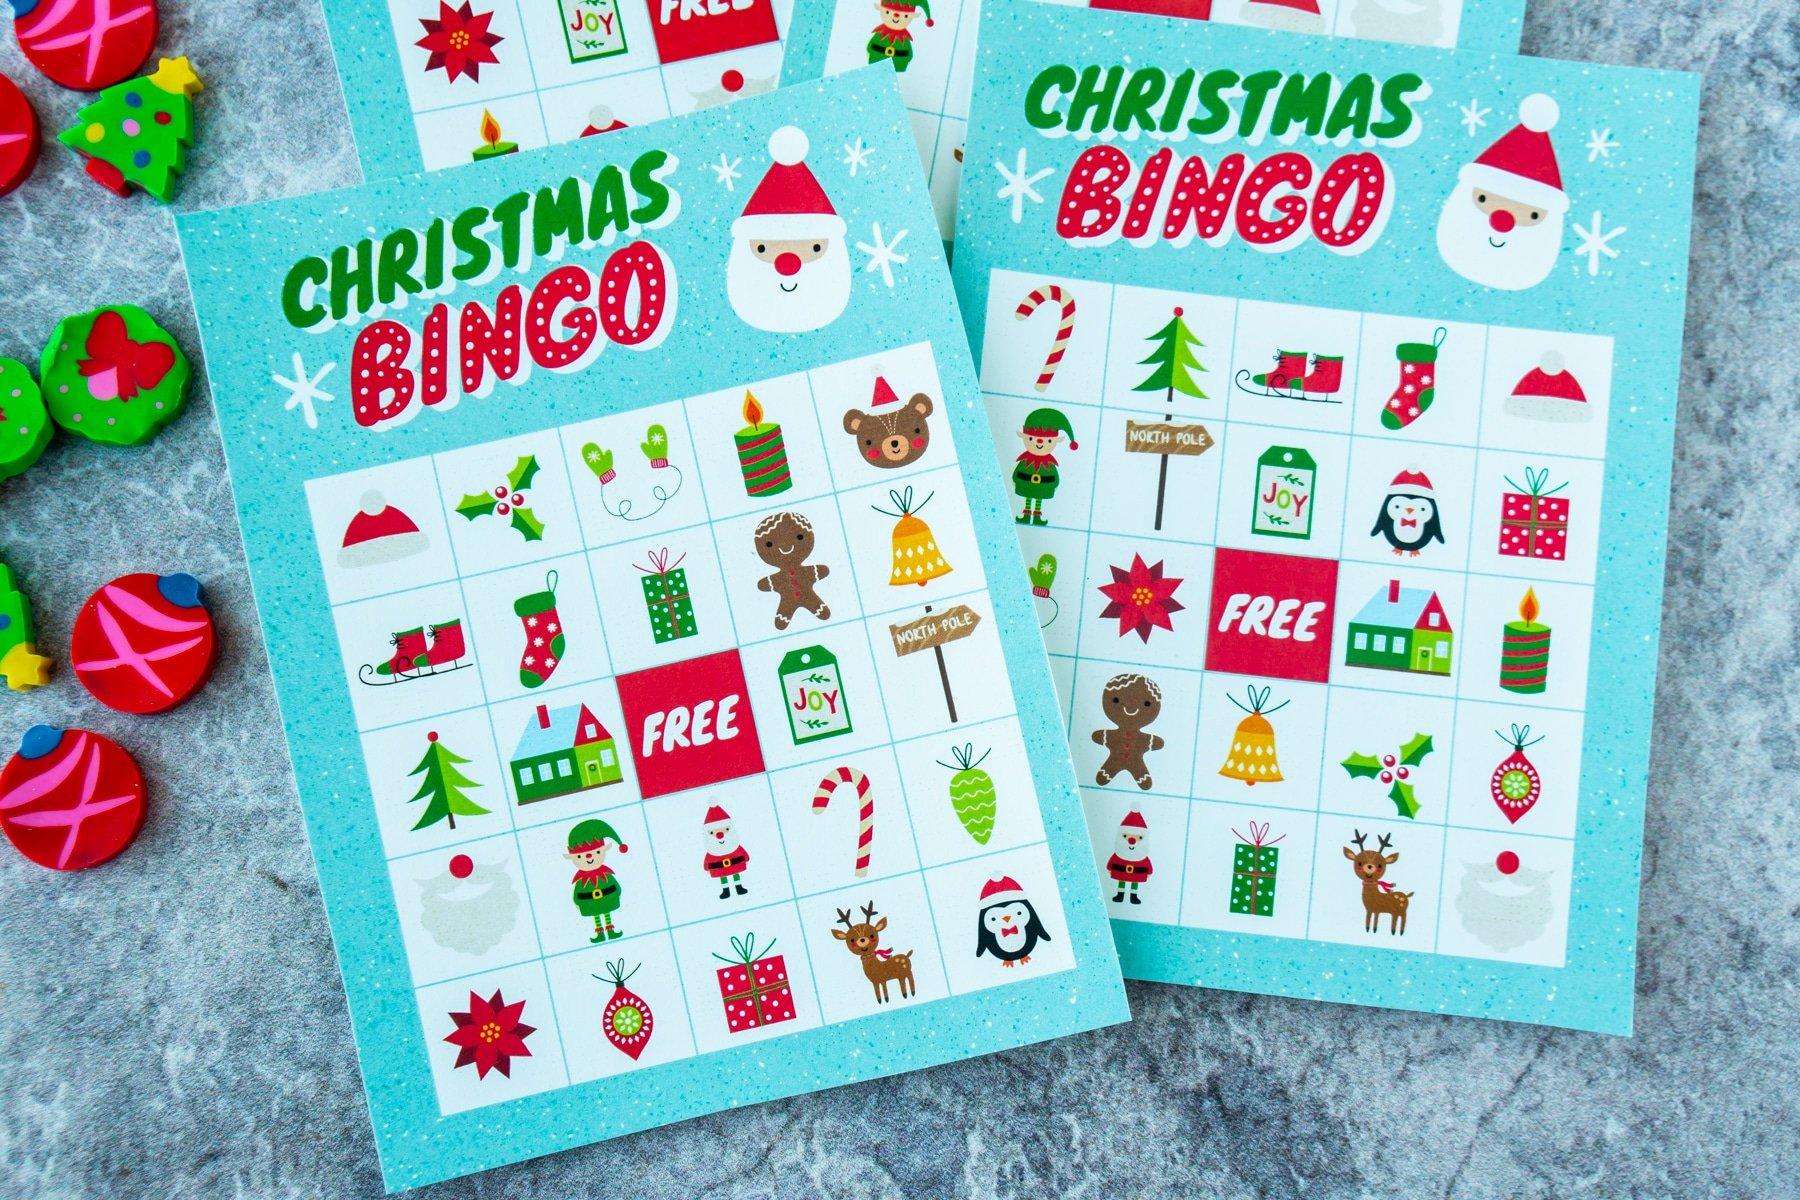 Horizontal image of two blank Christmas bingo cards